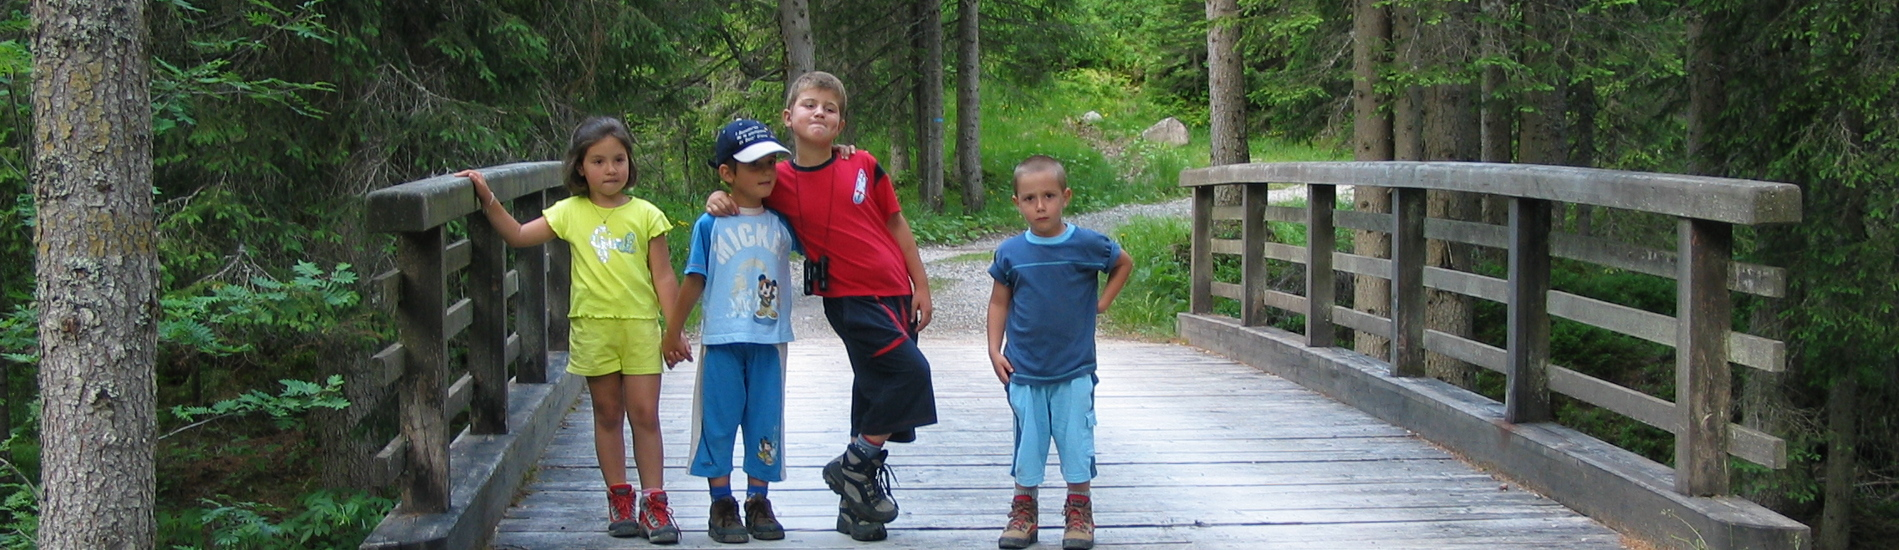 Offerta bimbi gratis in montagna